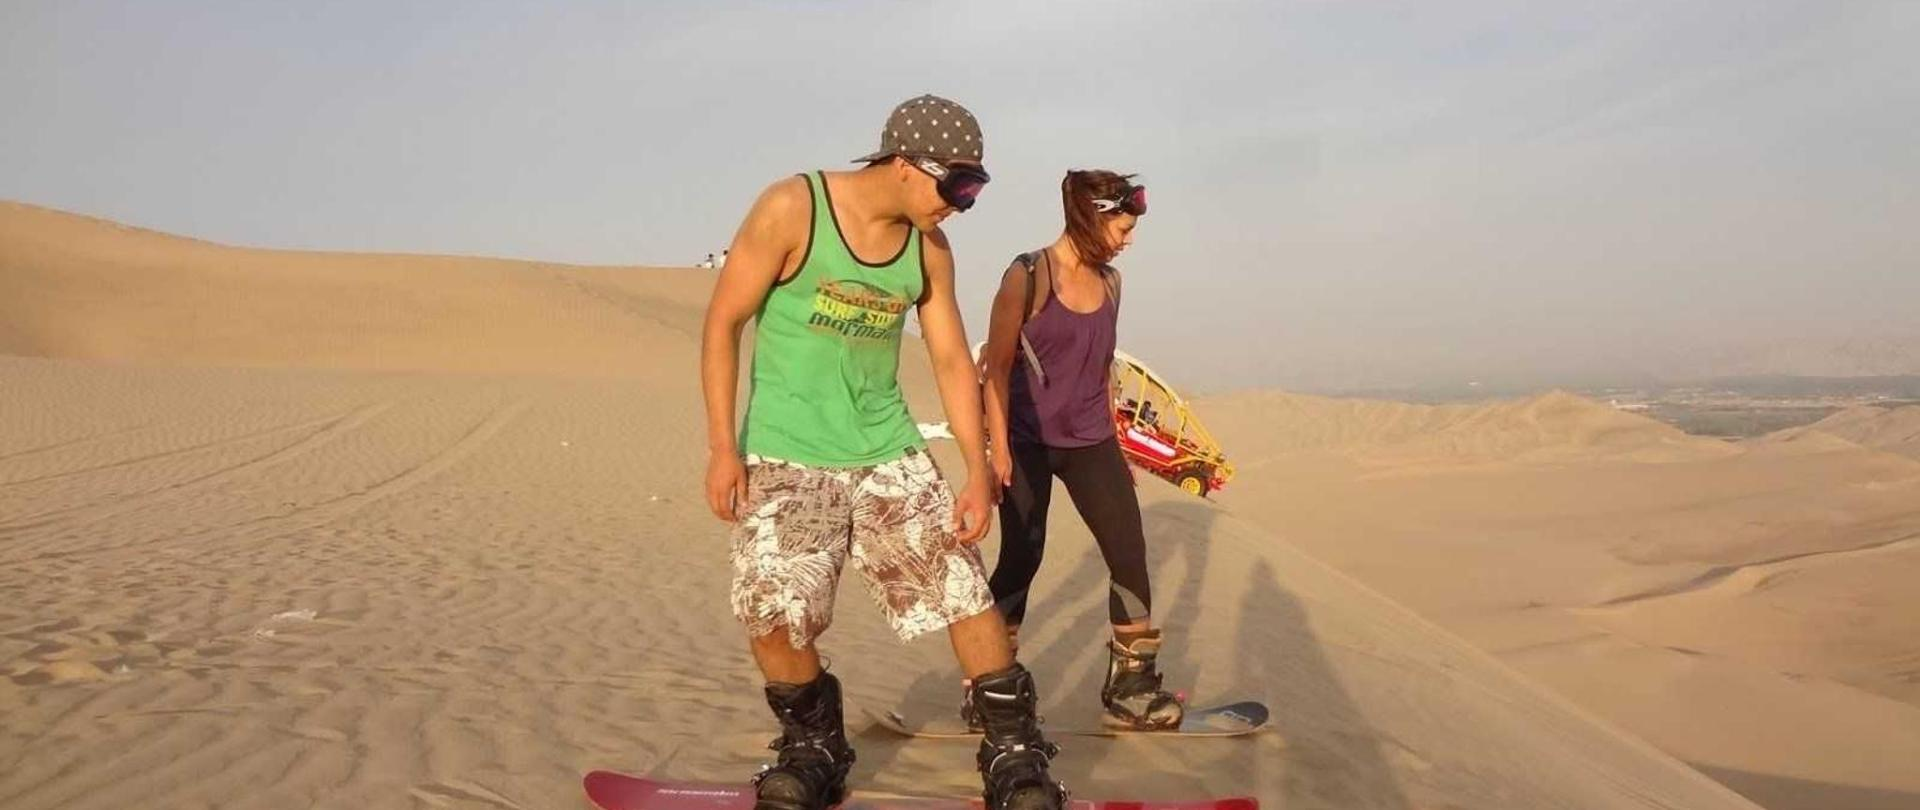 sandboarding1-1.jpg